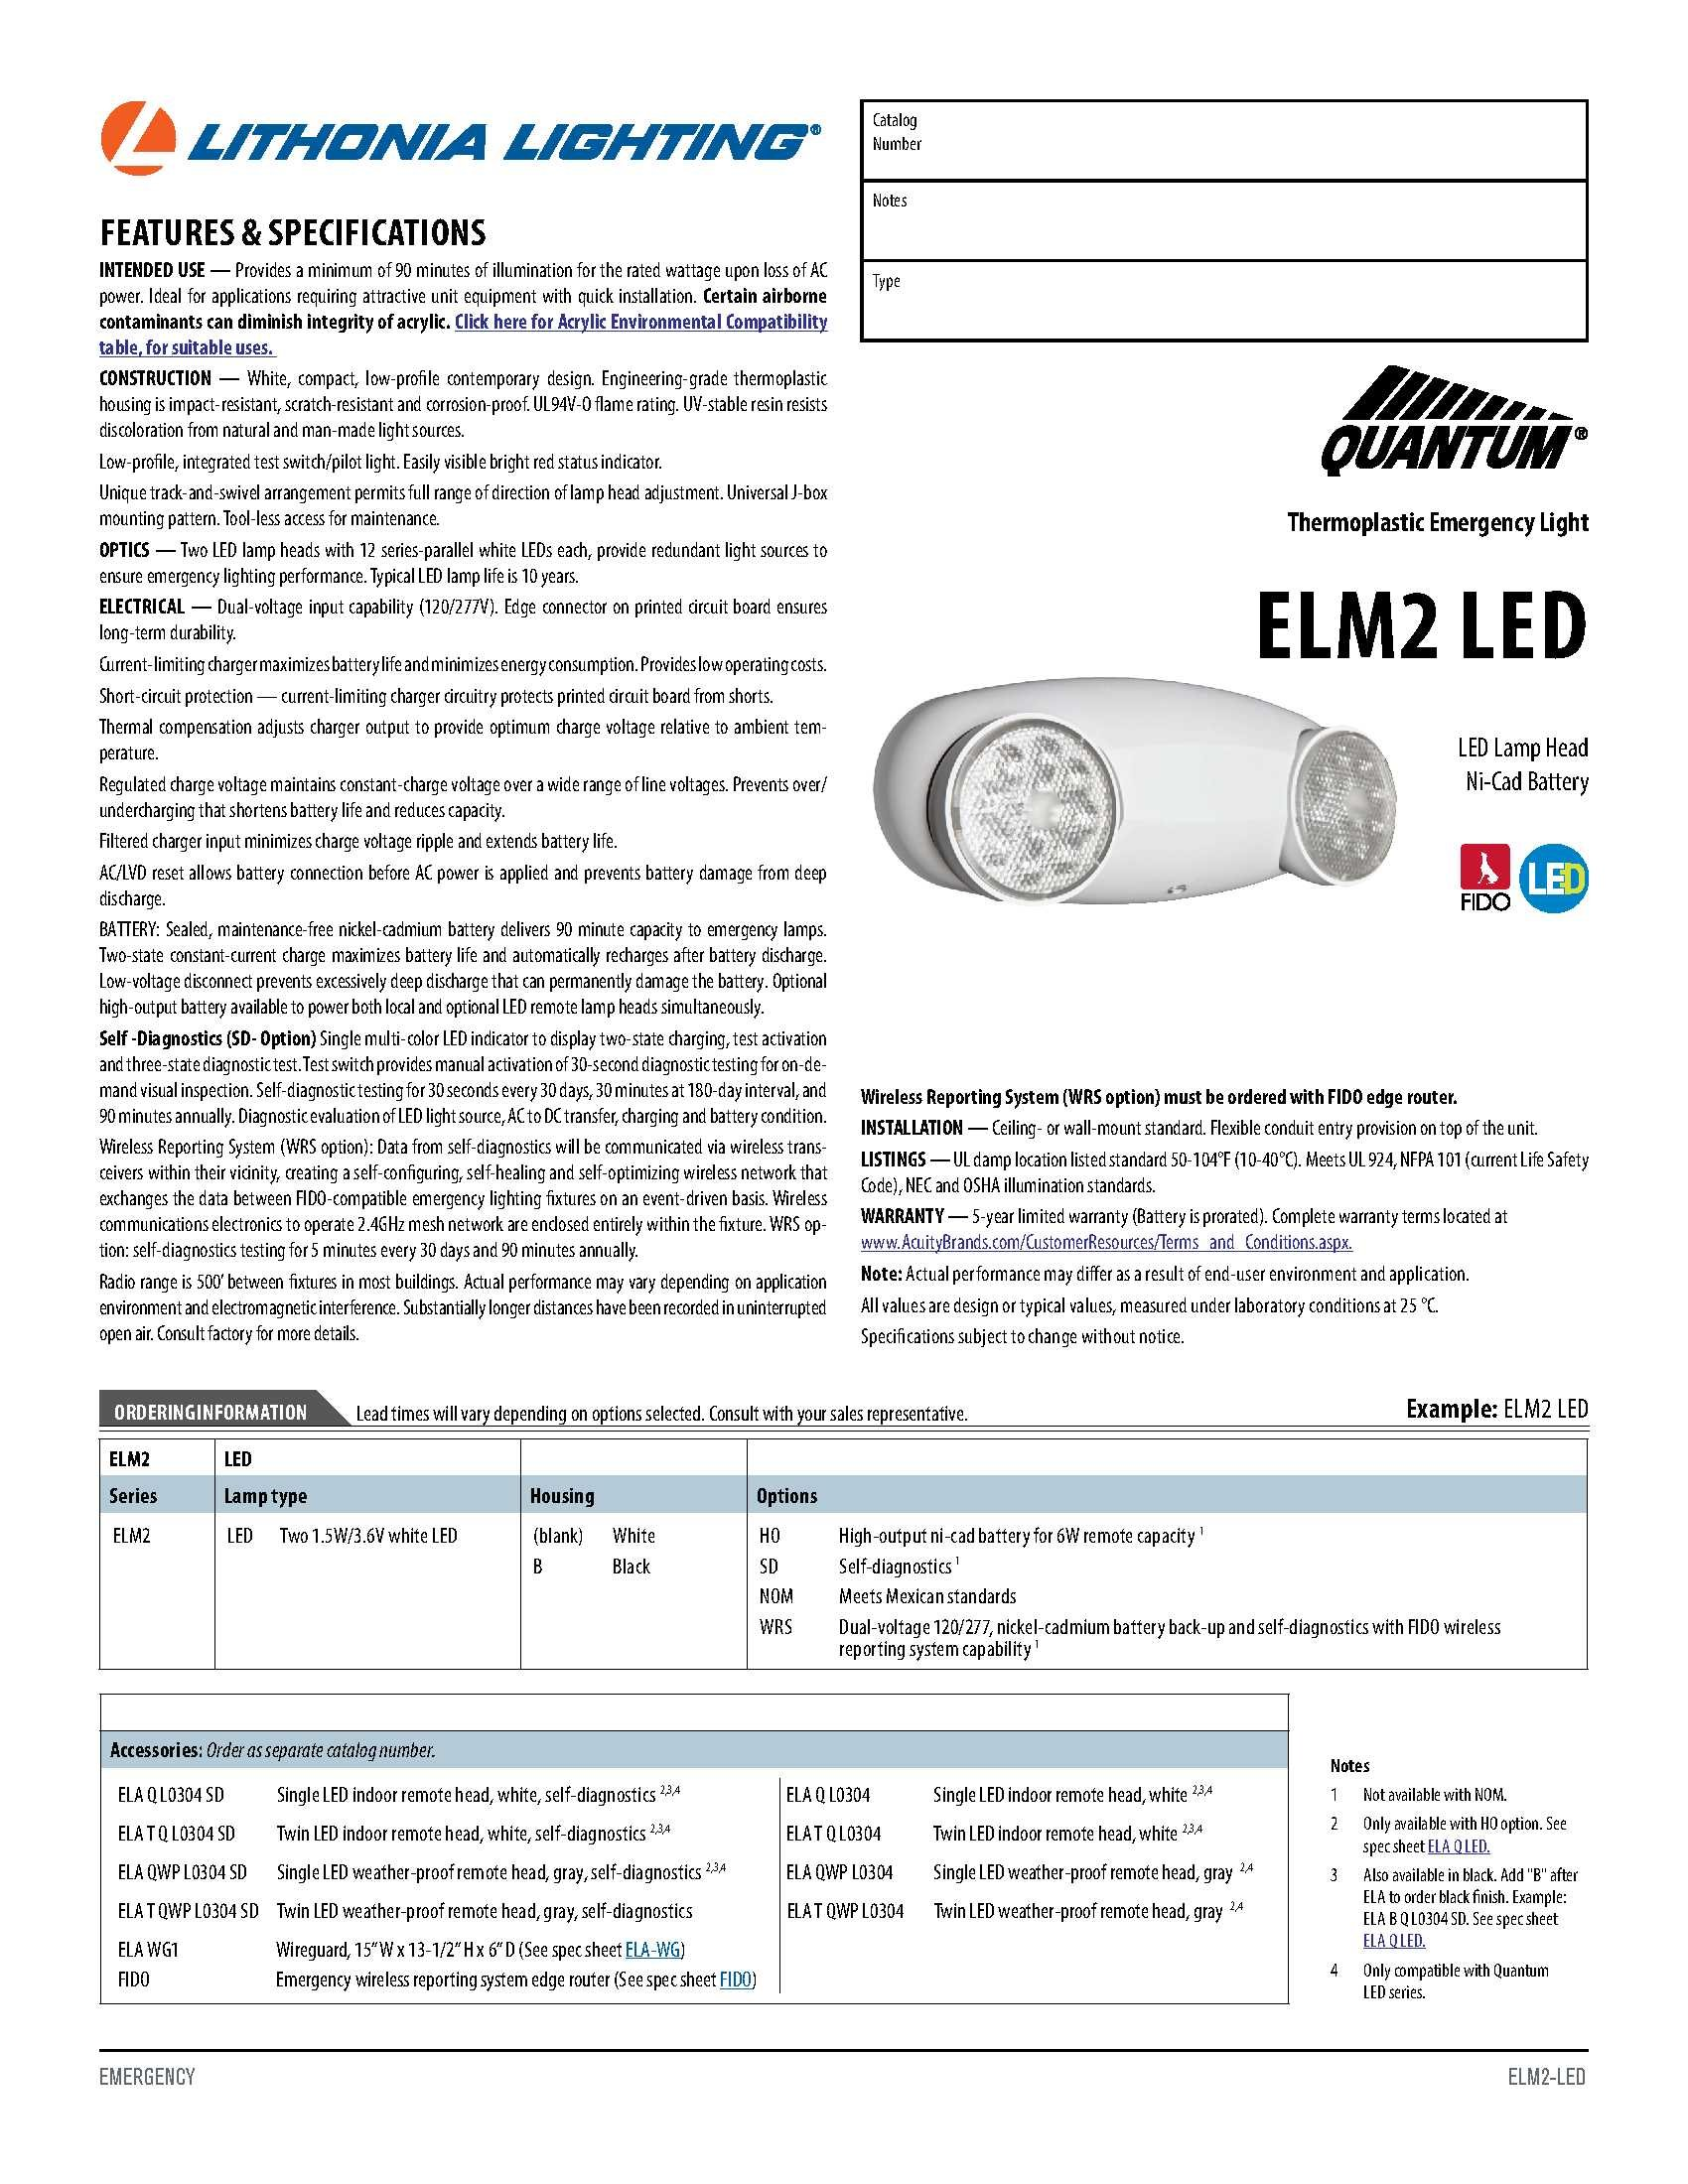 loftek led flood light manual